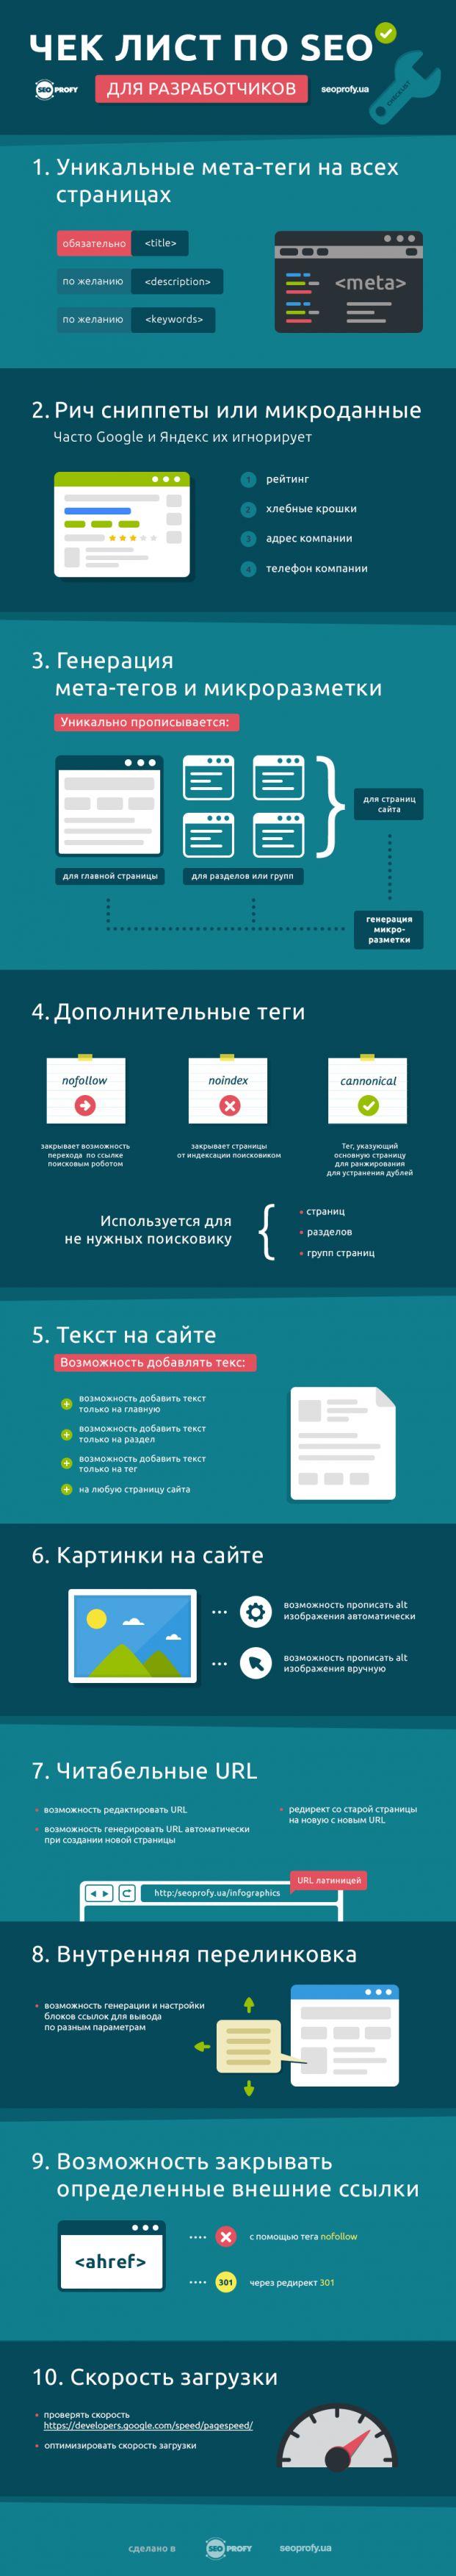 Сделано в #SEOProfy с ошибками. ) Чек лист по #SEO для разработчиков – #infographica http://seoprofy.ua/blog/optimizaciya-sajtov/seo-checklist-for-dev via @seoprofy_ua #b24